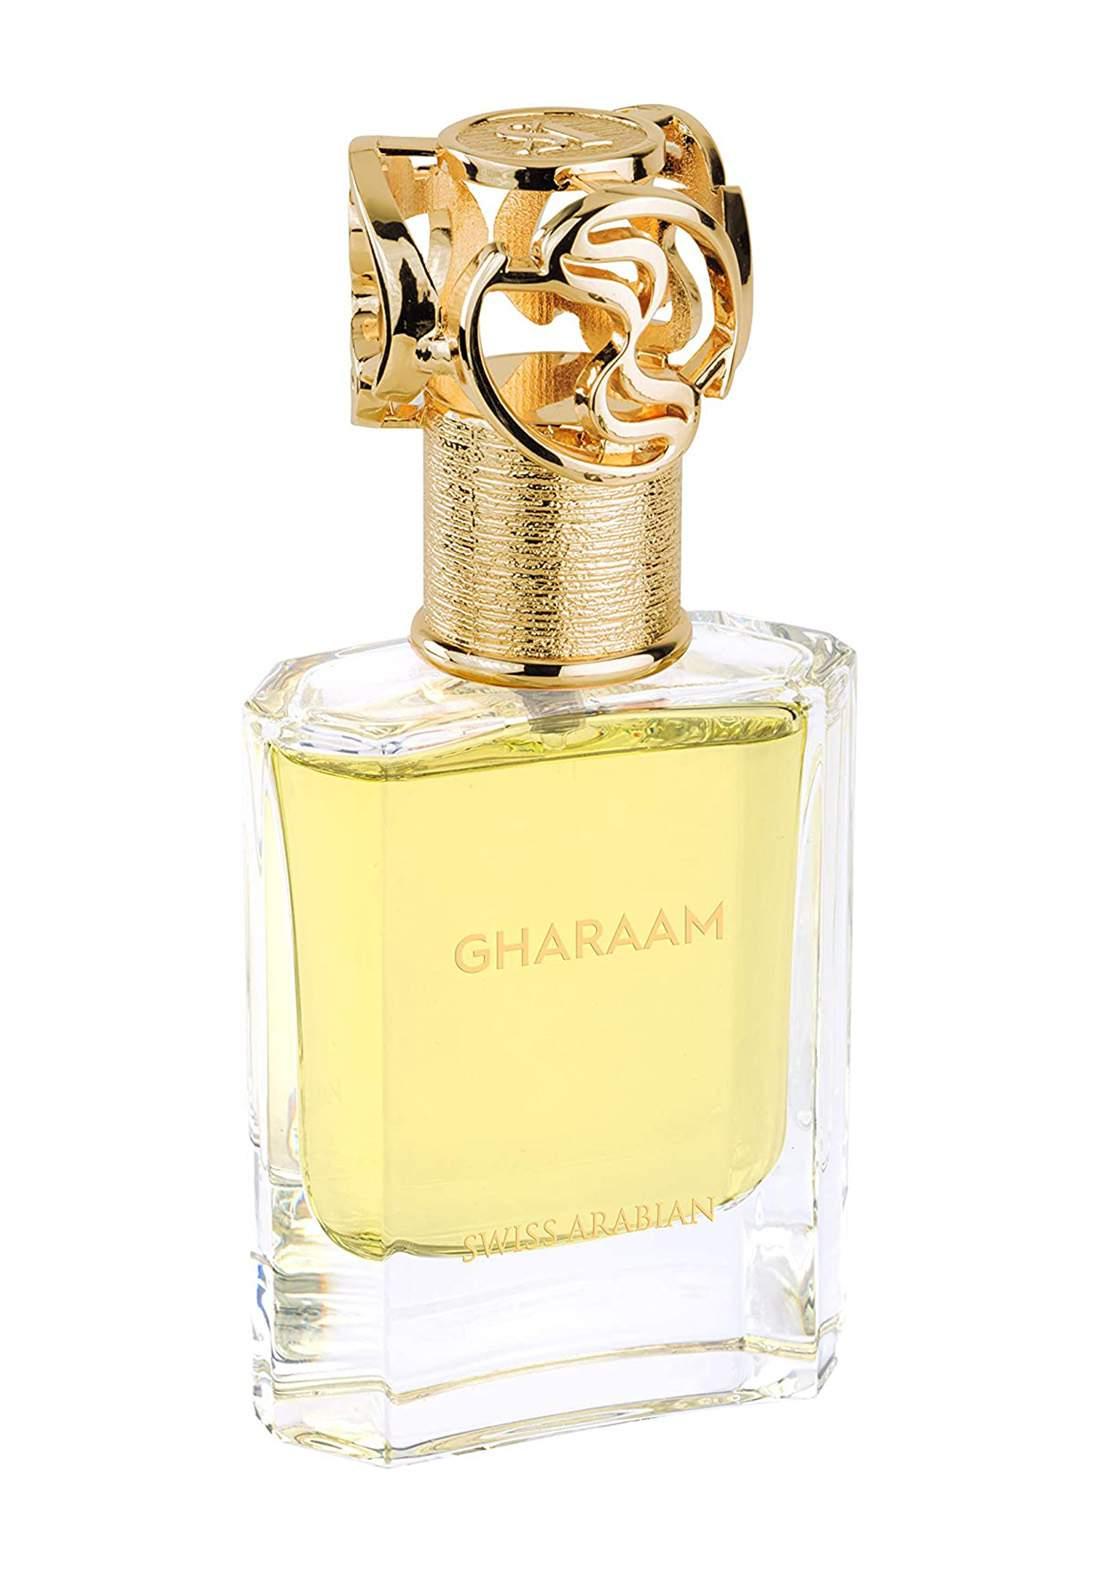 Swiss Arabian  1080 Wajd Eau De Parfum 50ml 50ml unisex عطر  لكلا الجنسين